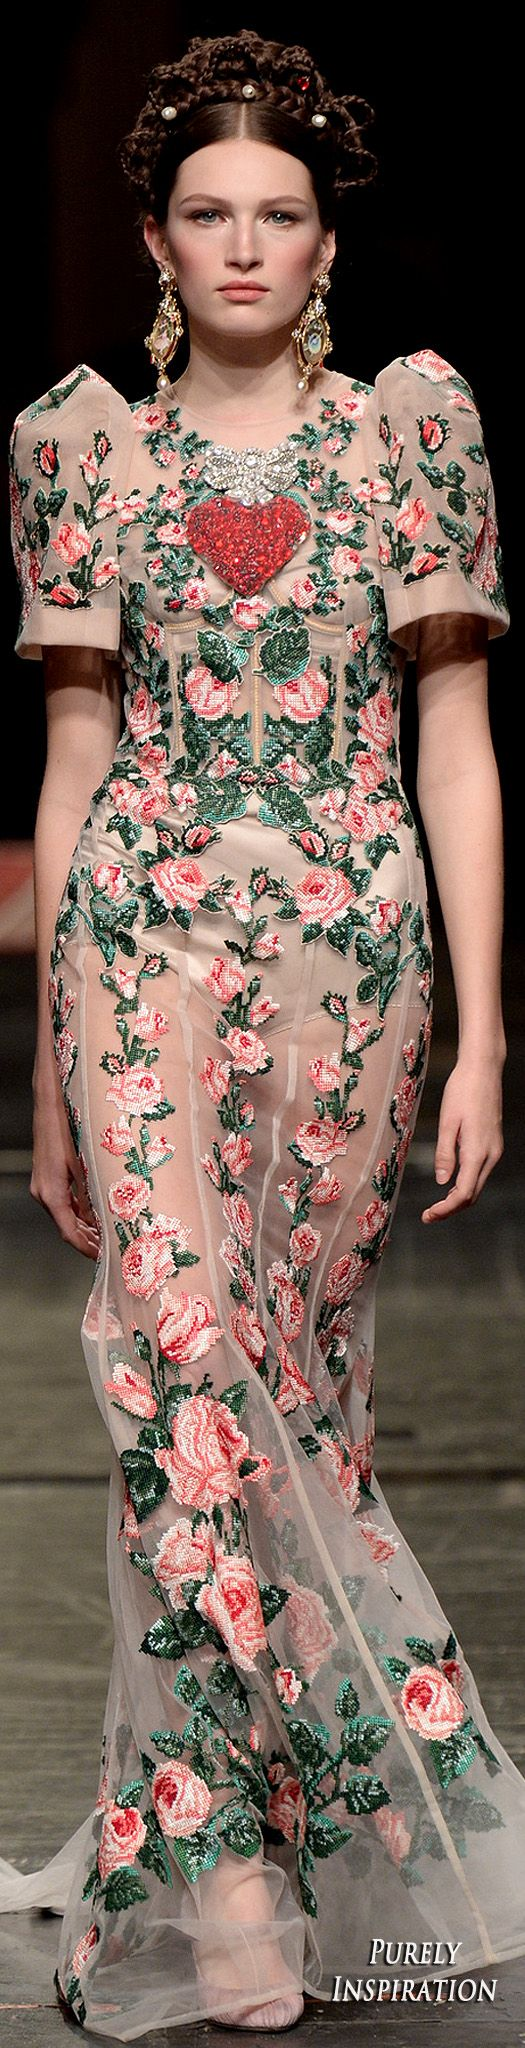 Dolce & Gabbana 2016 Alta Moda Collection   Purely Inspiration